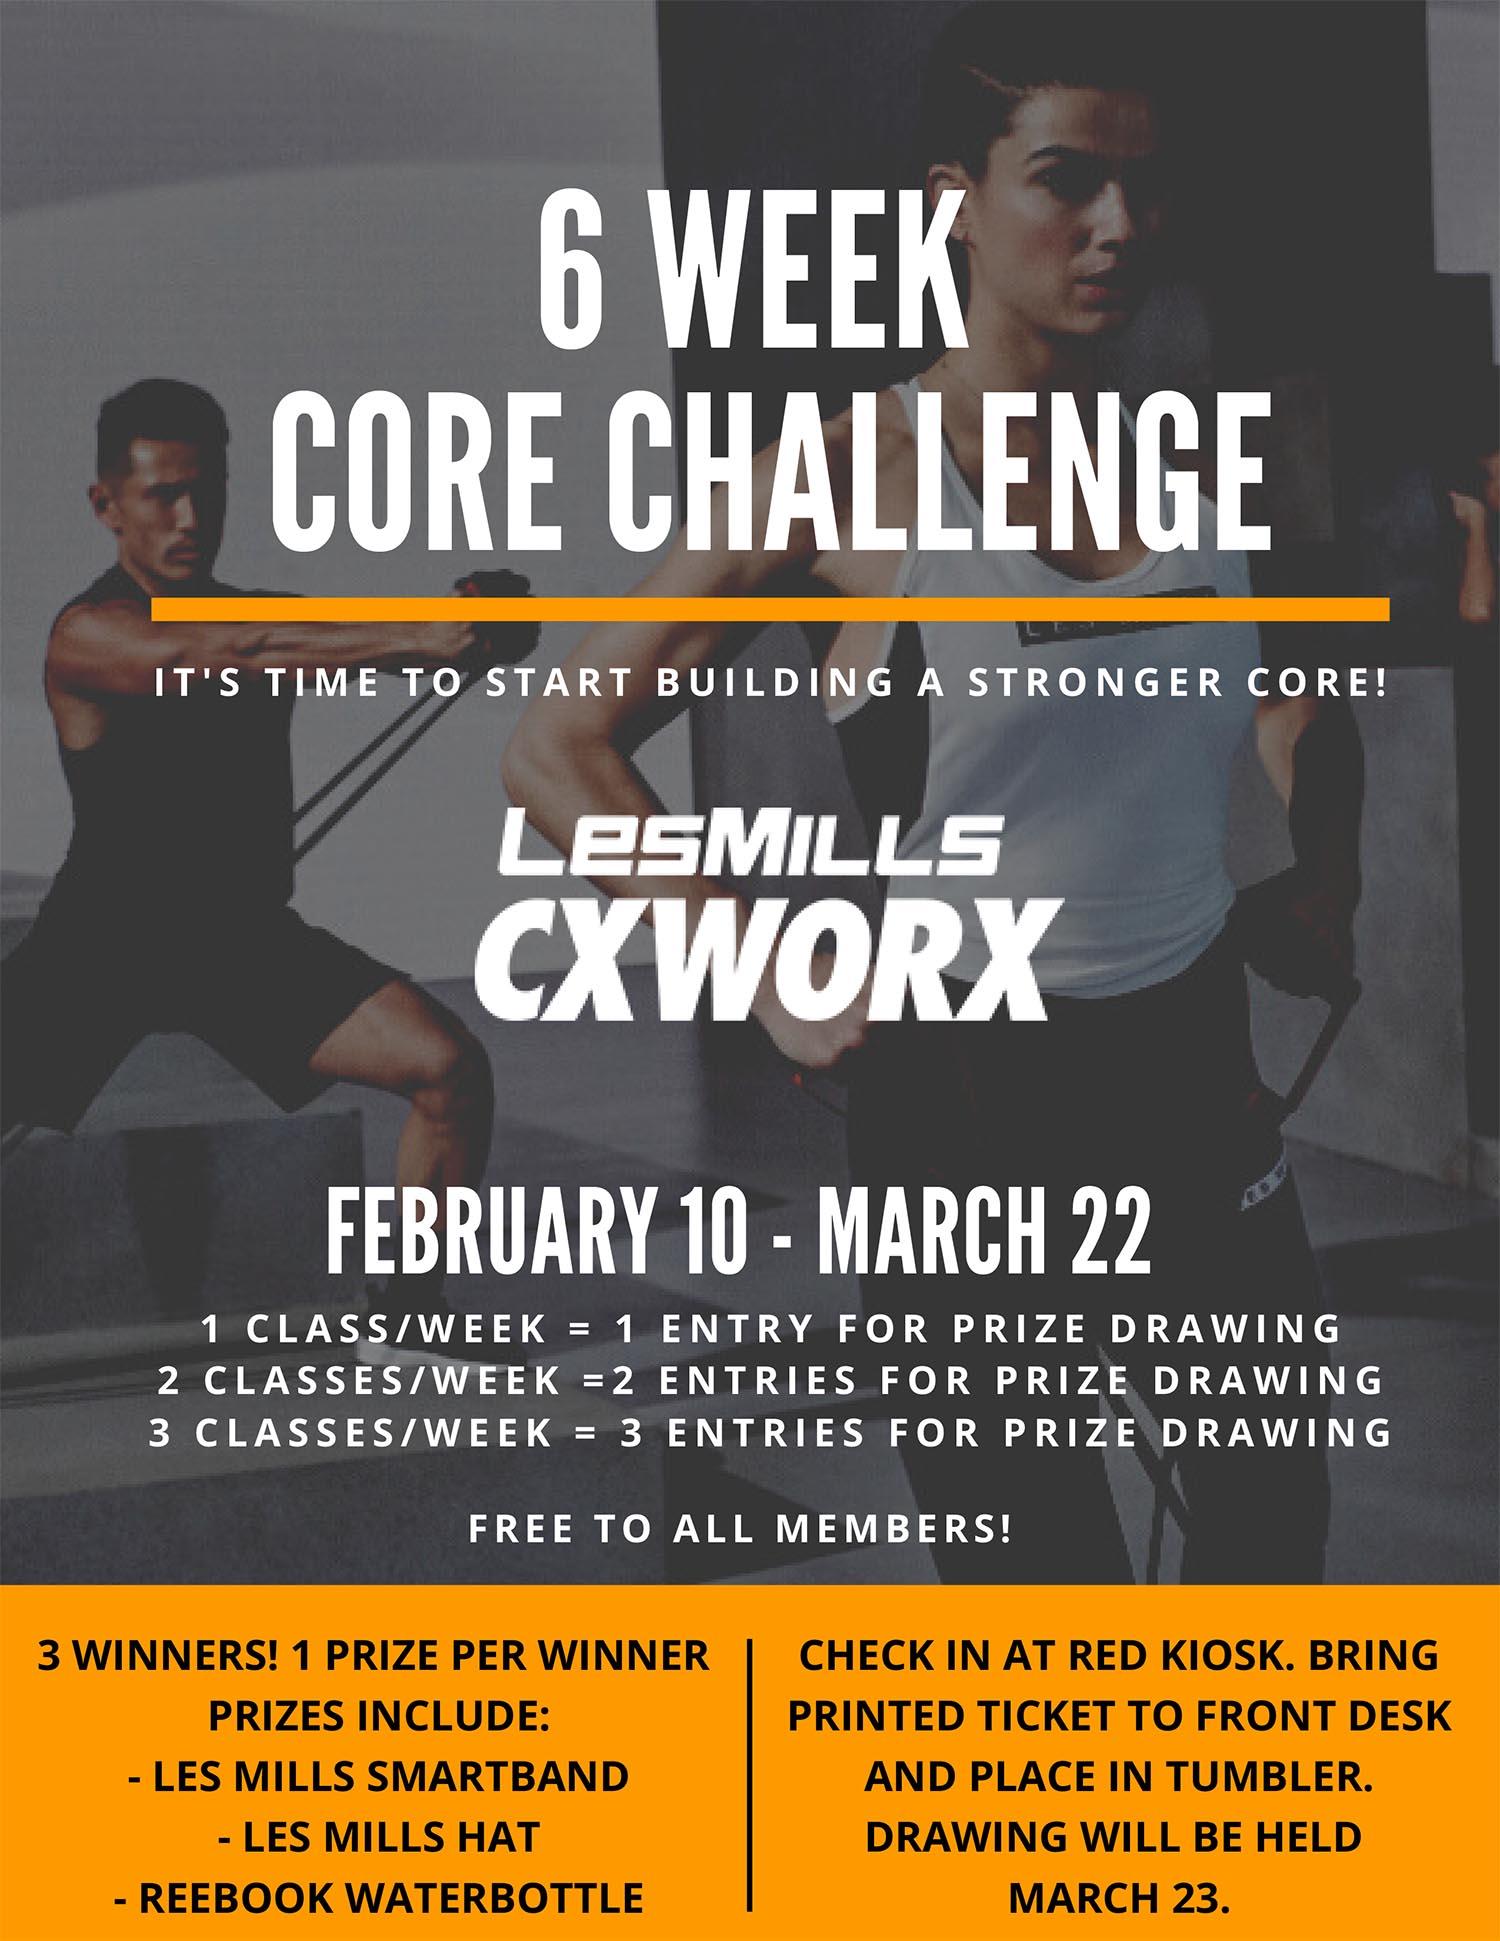 6 Week Core Challenge